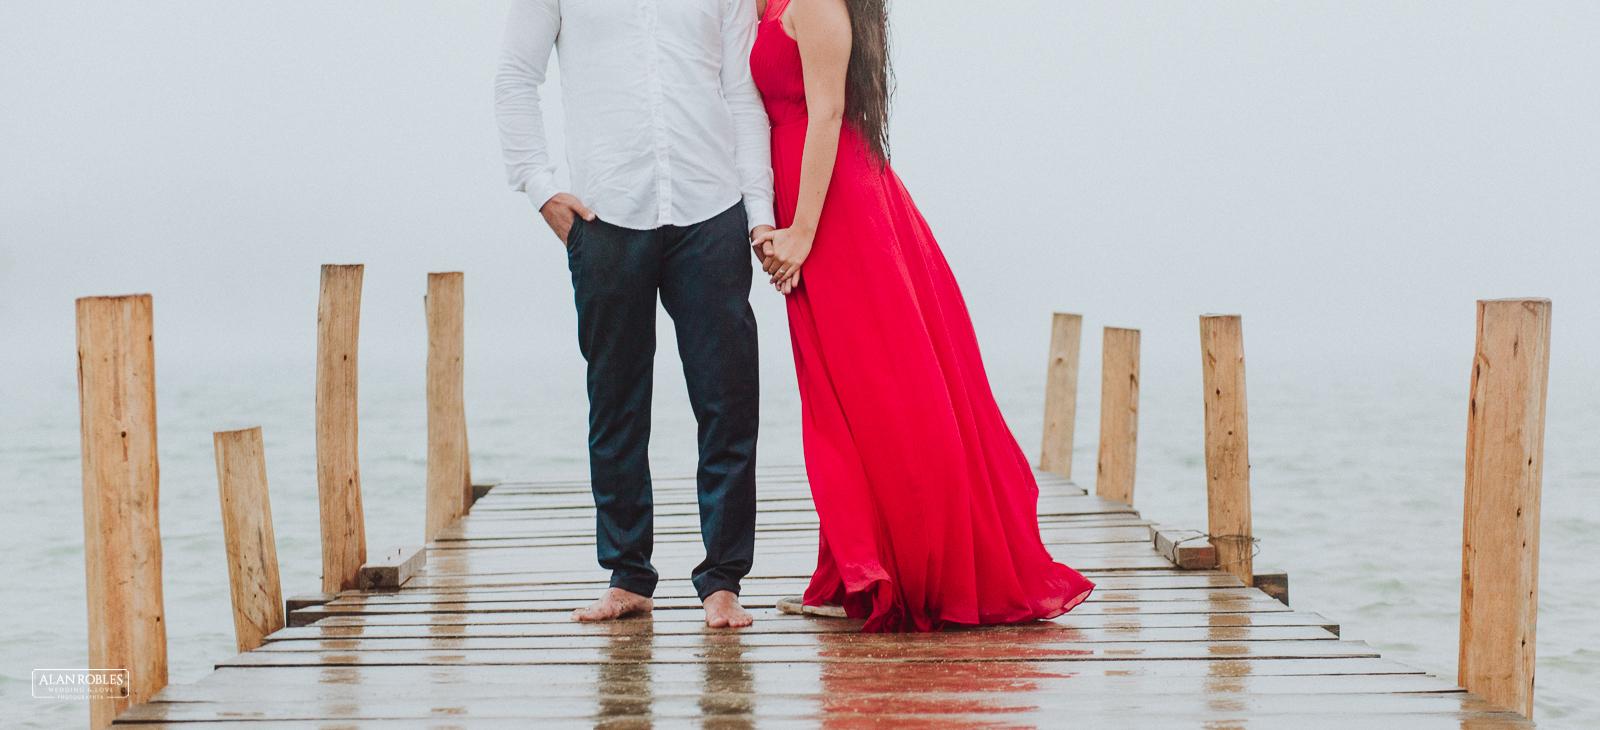 Fotografo de bodas Alan Robles-Pre boda Chiapas-17